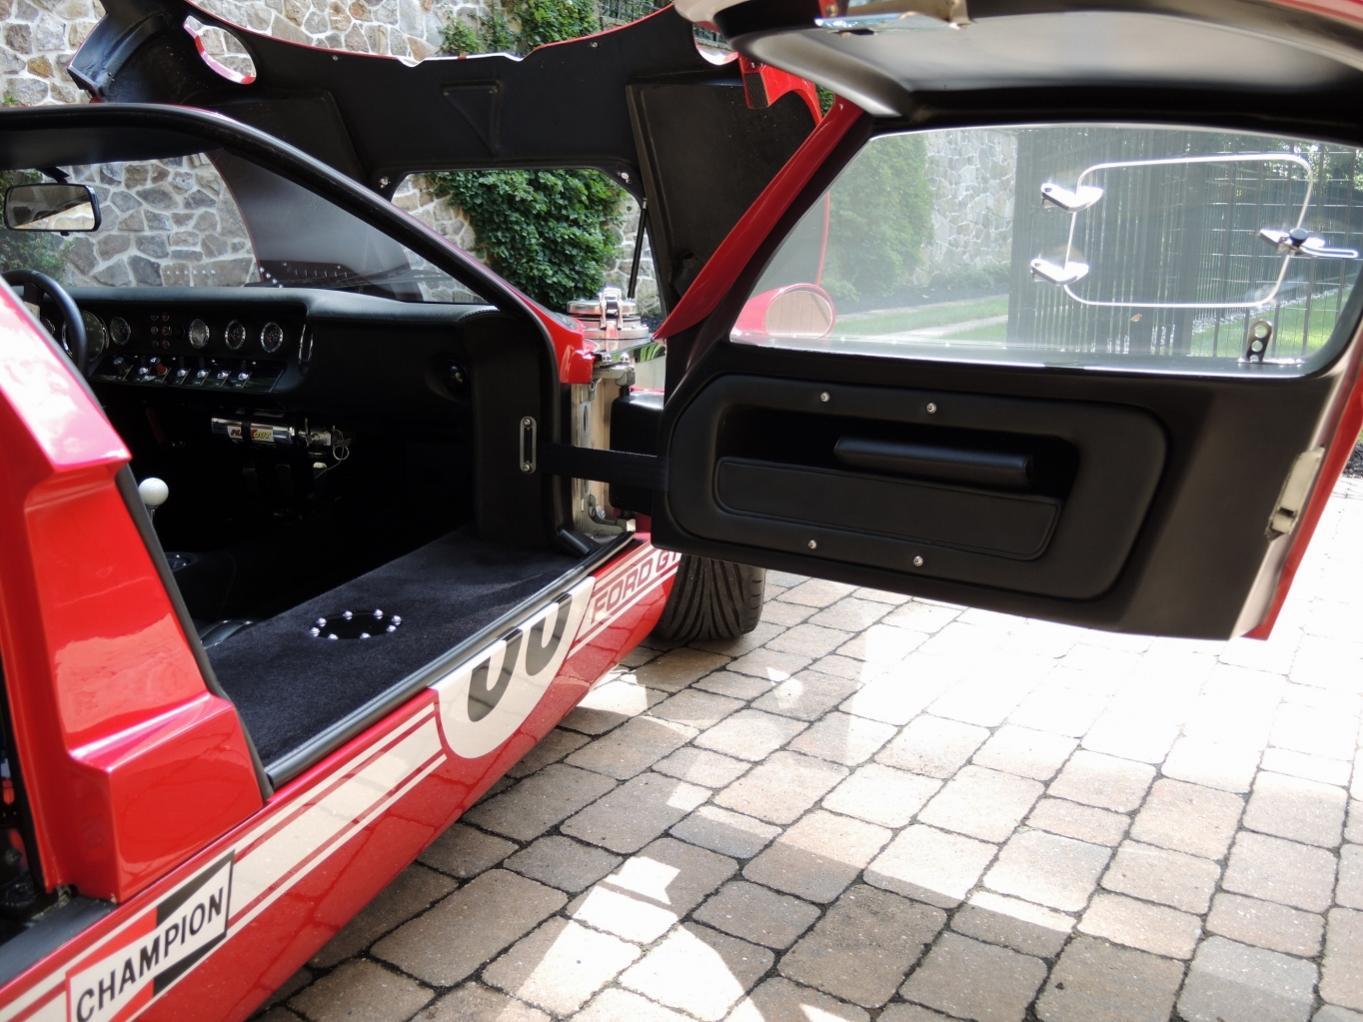 1966 CAV GT For Sale **SOLD**-interior-3-1920x1440-1364x1023-jpg